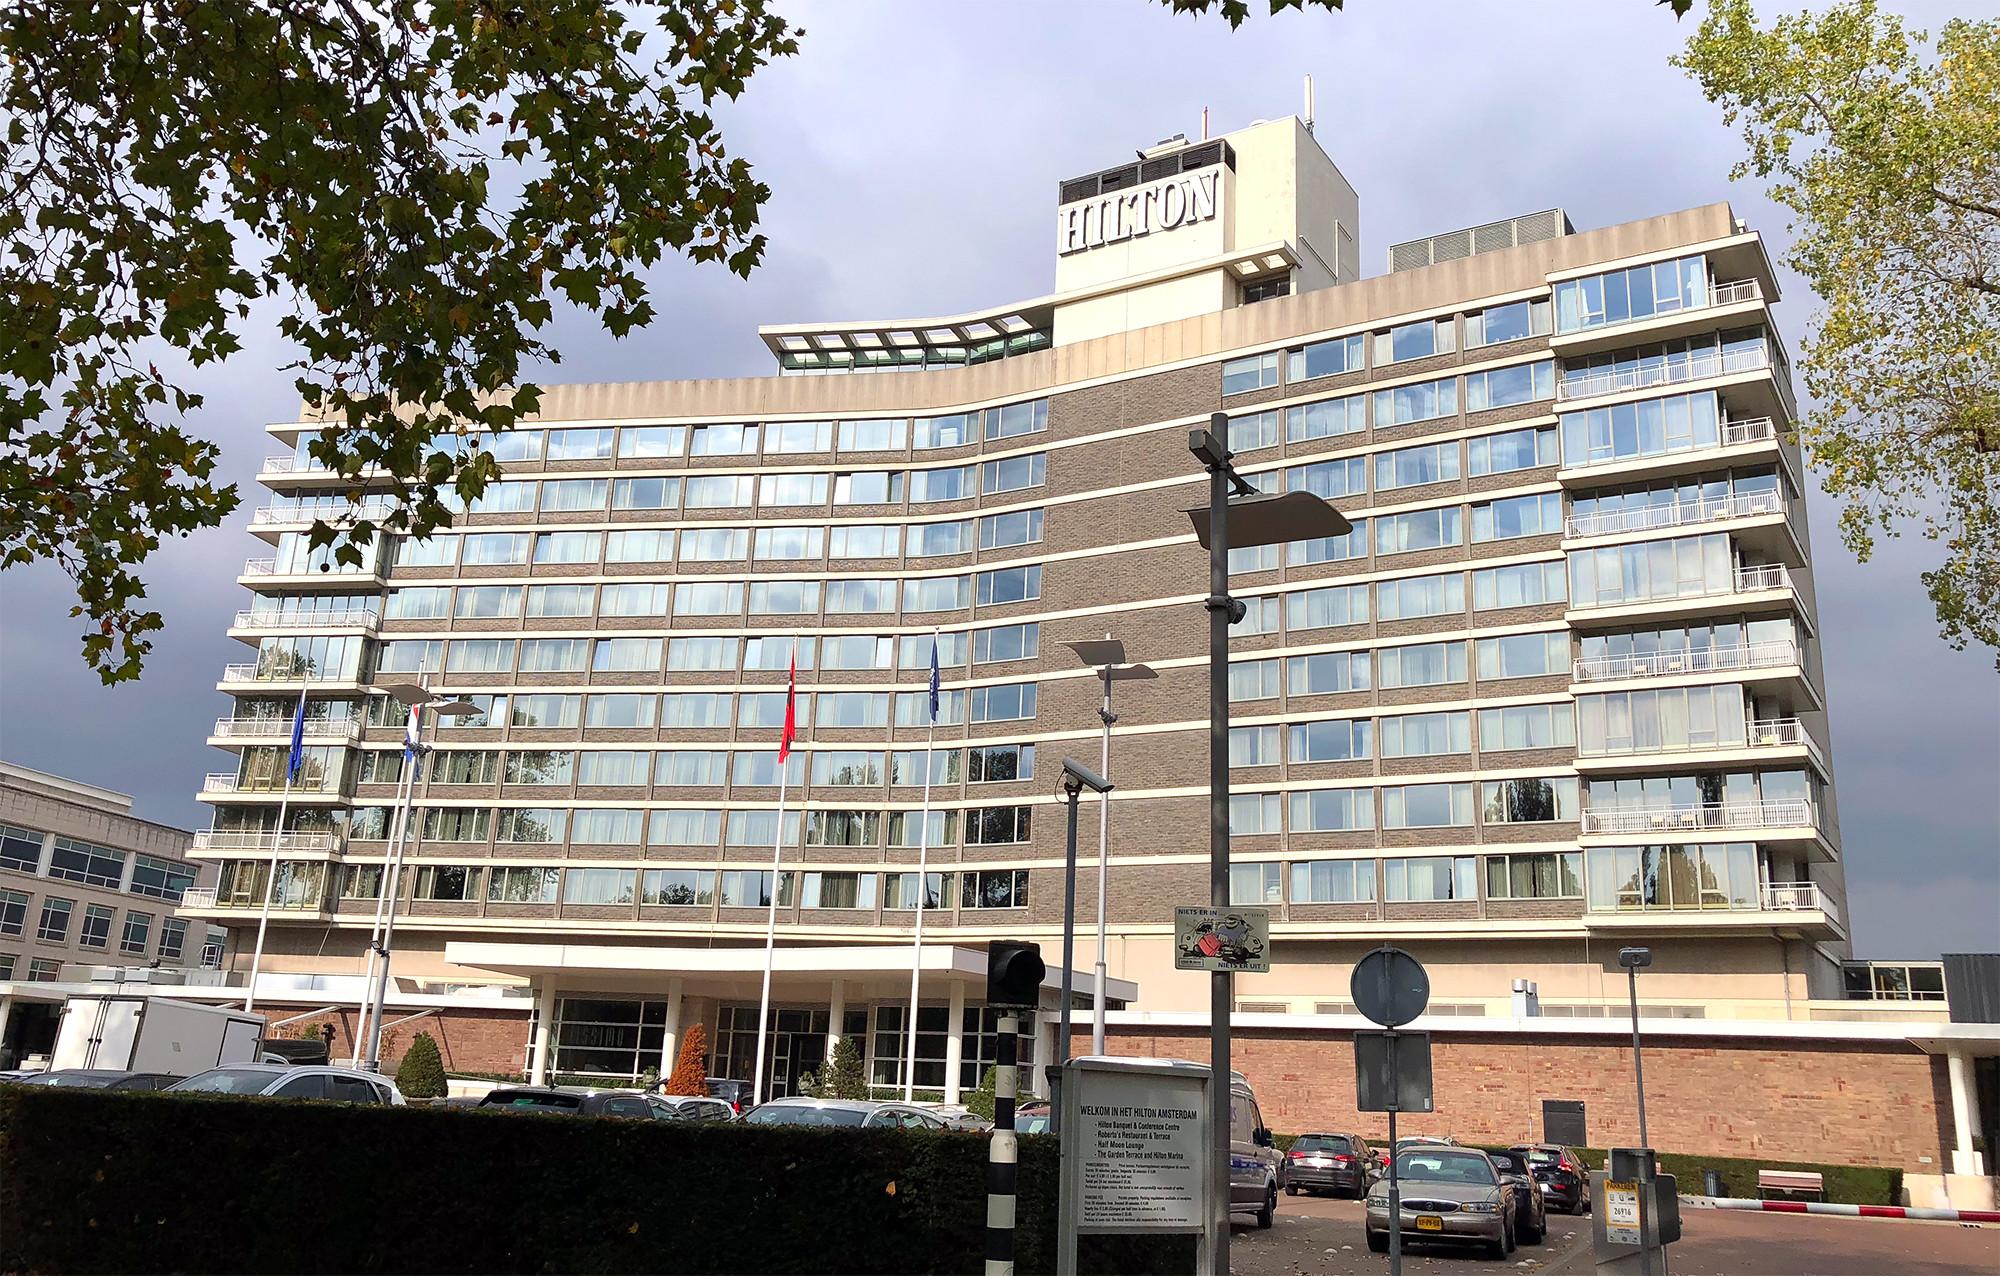 Hotel Hilton Amsterdam - Thewotme hilton amsterdam - 50916244821 3e797d71c0 k - El emblemático Hotel Hilton Ámsterdam